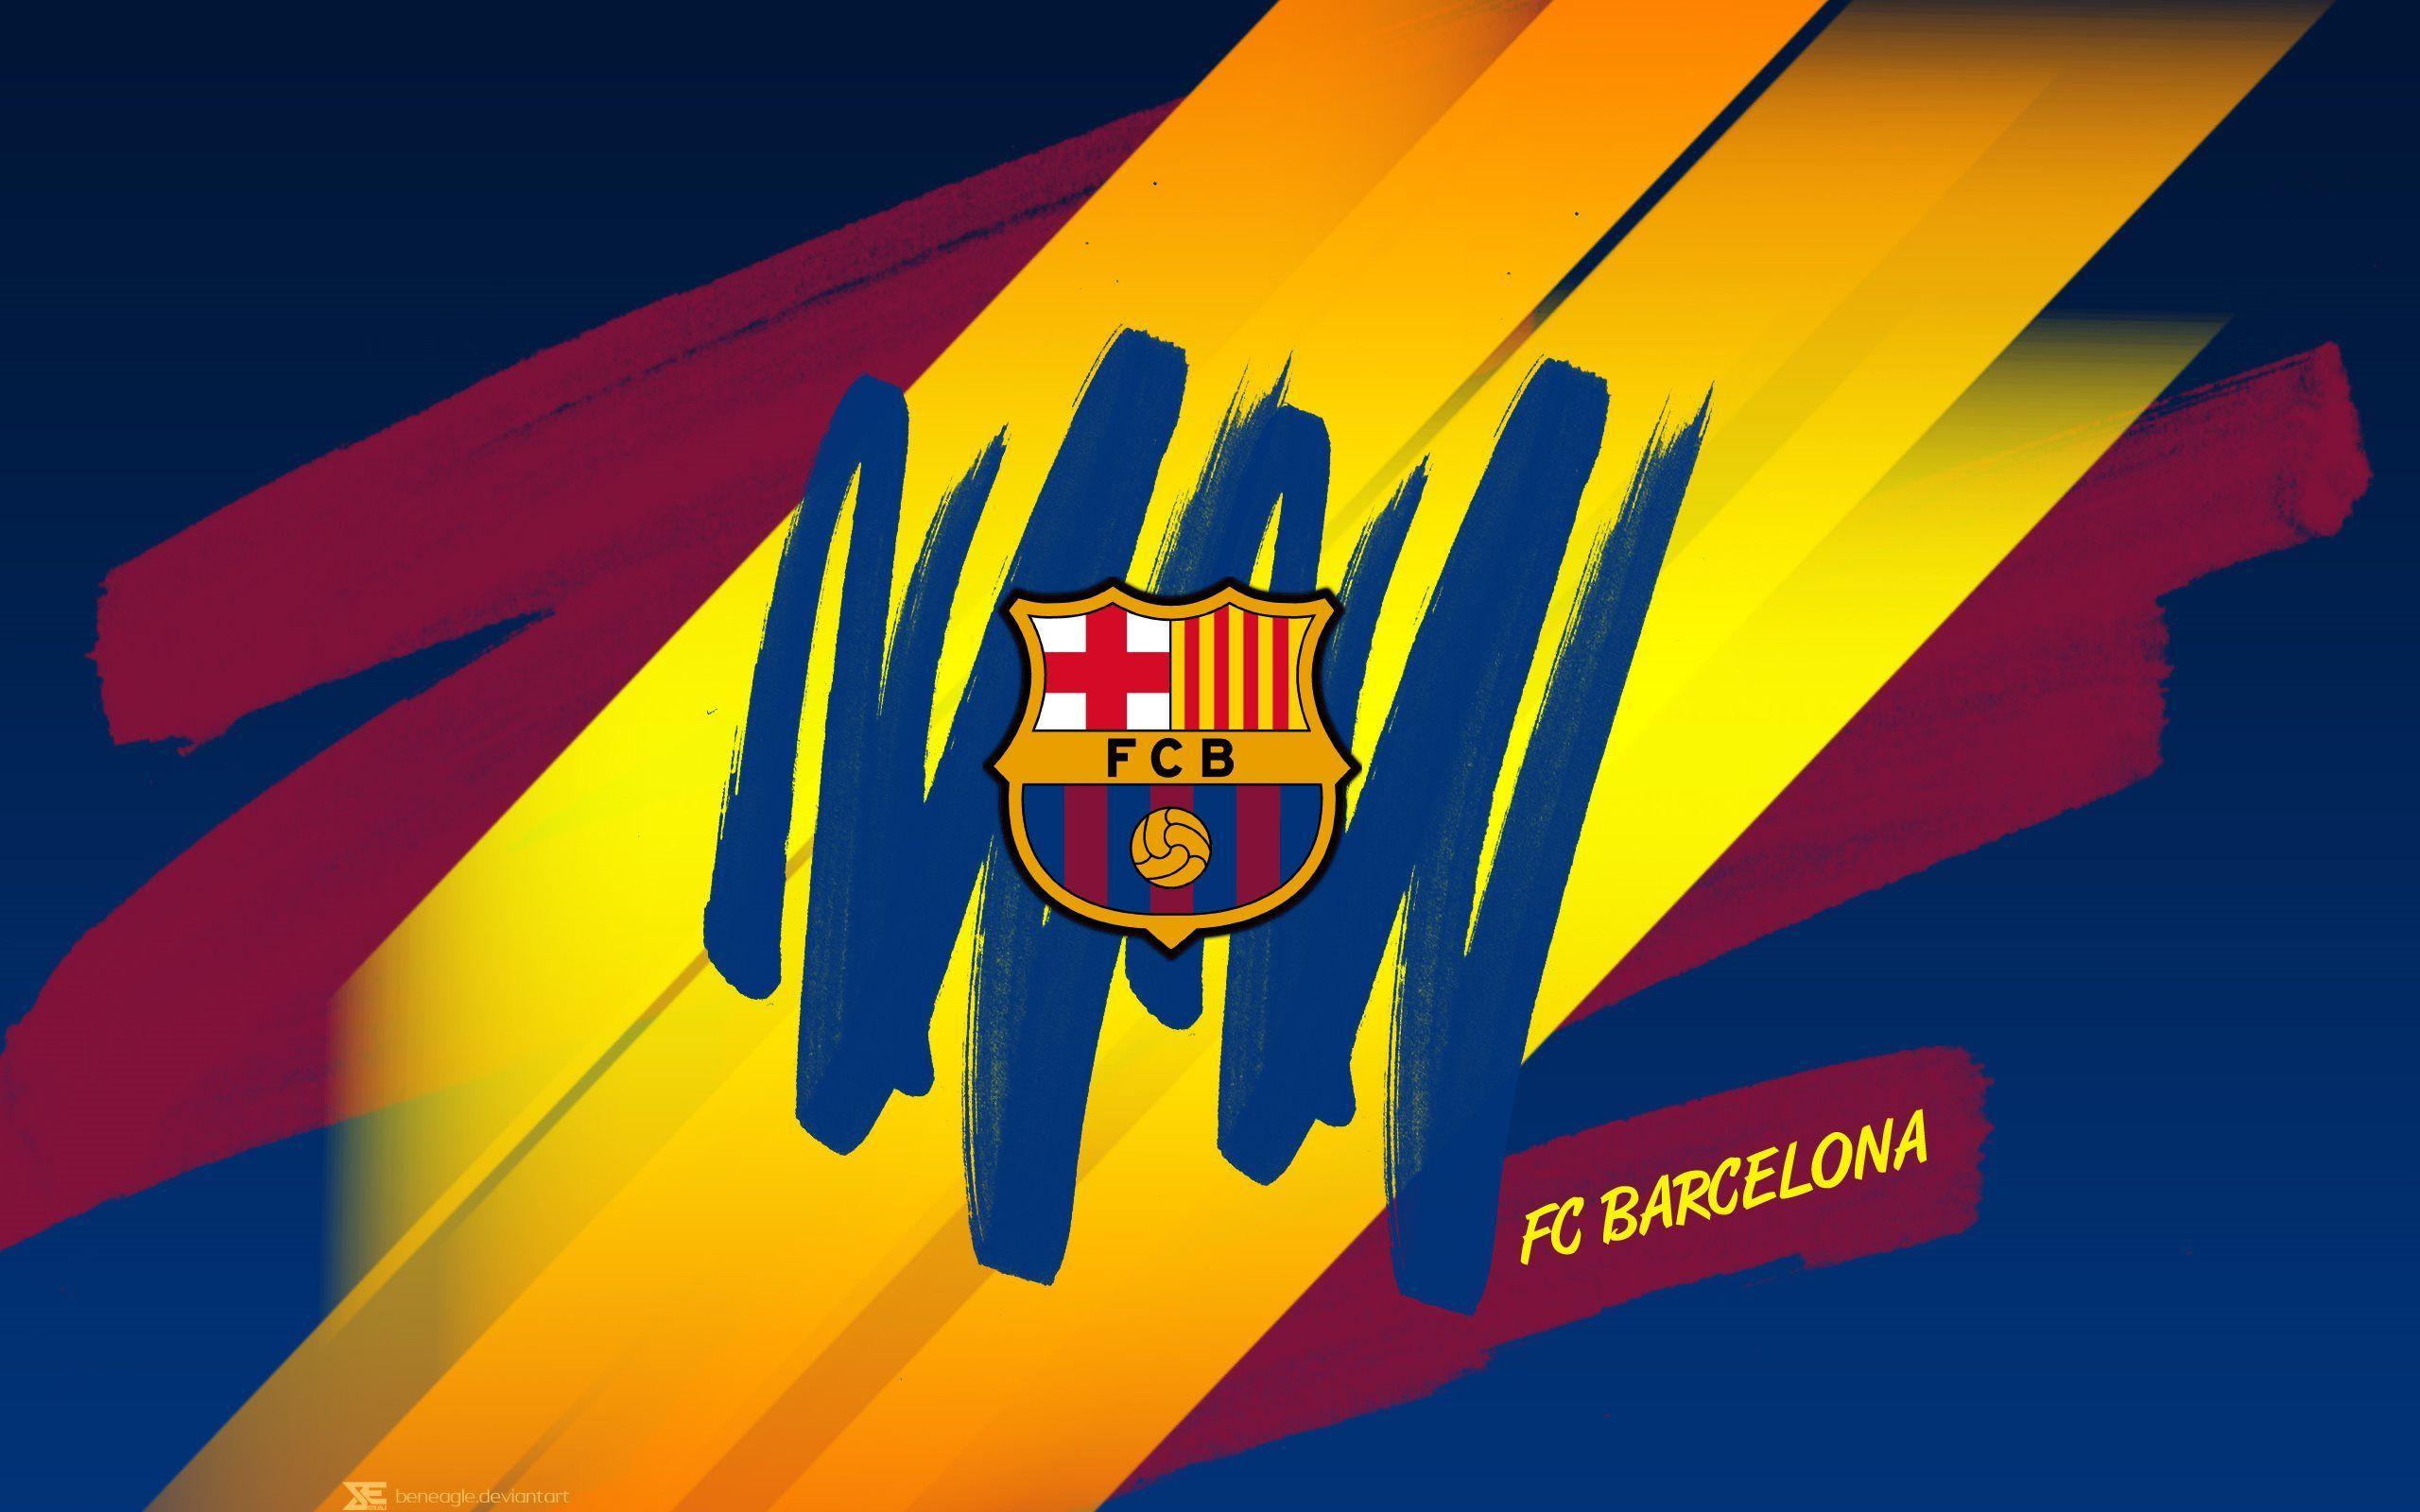 Fc Barcelona 2016 Wallpapers 2560x1600